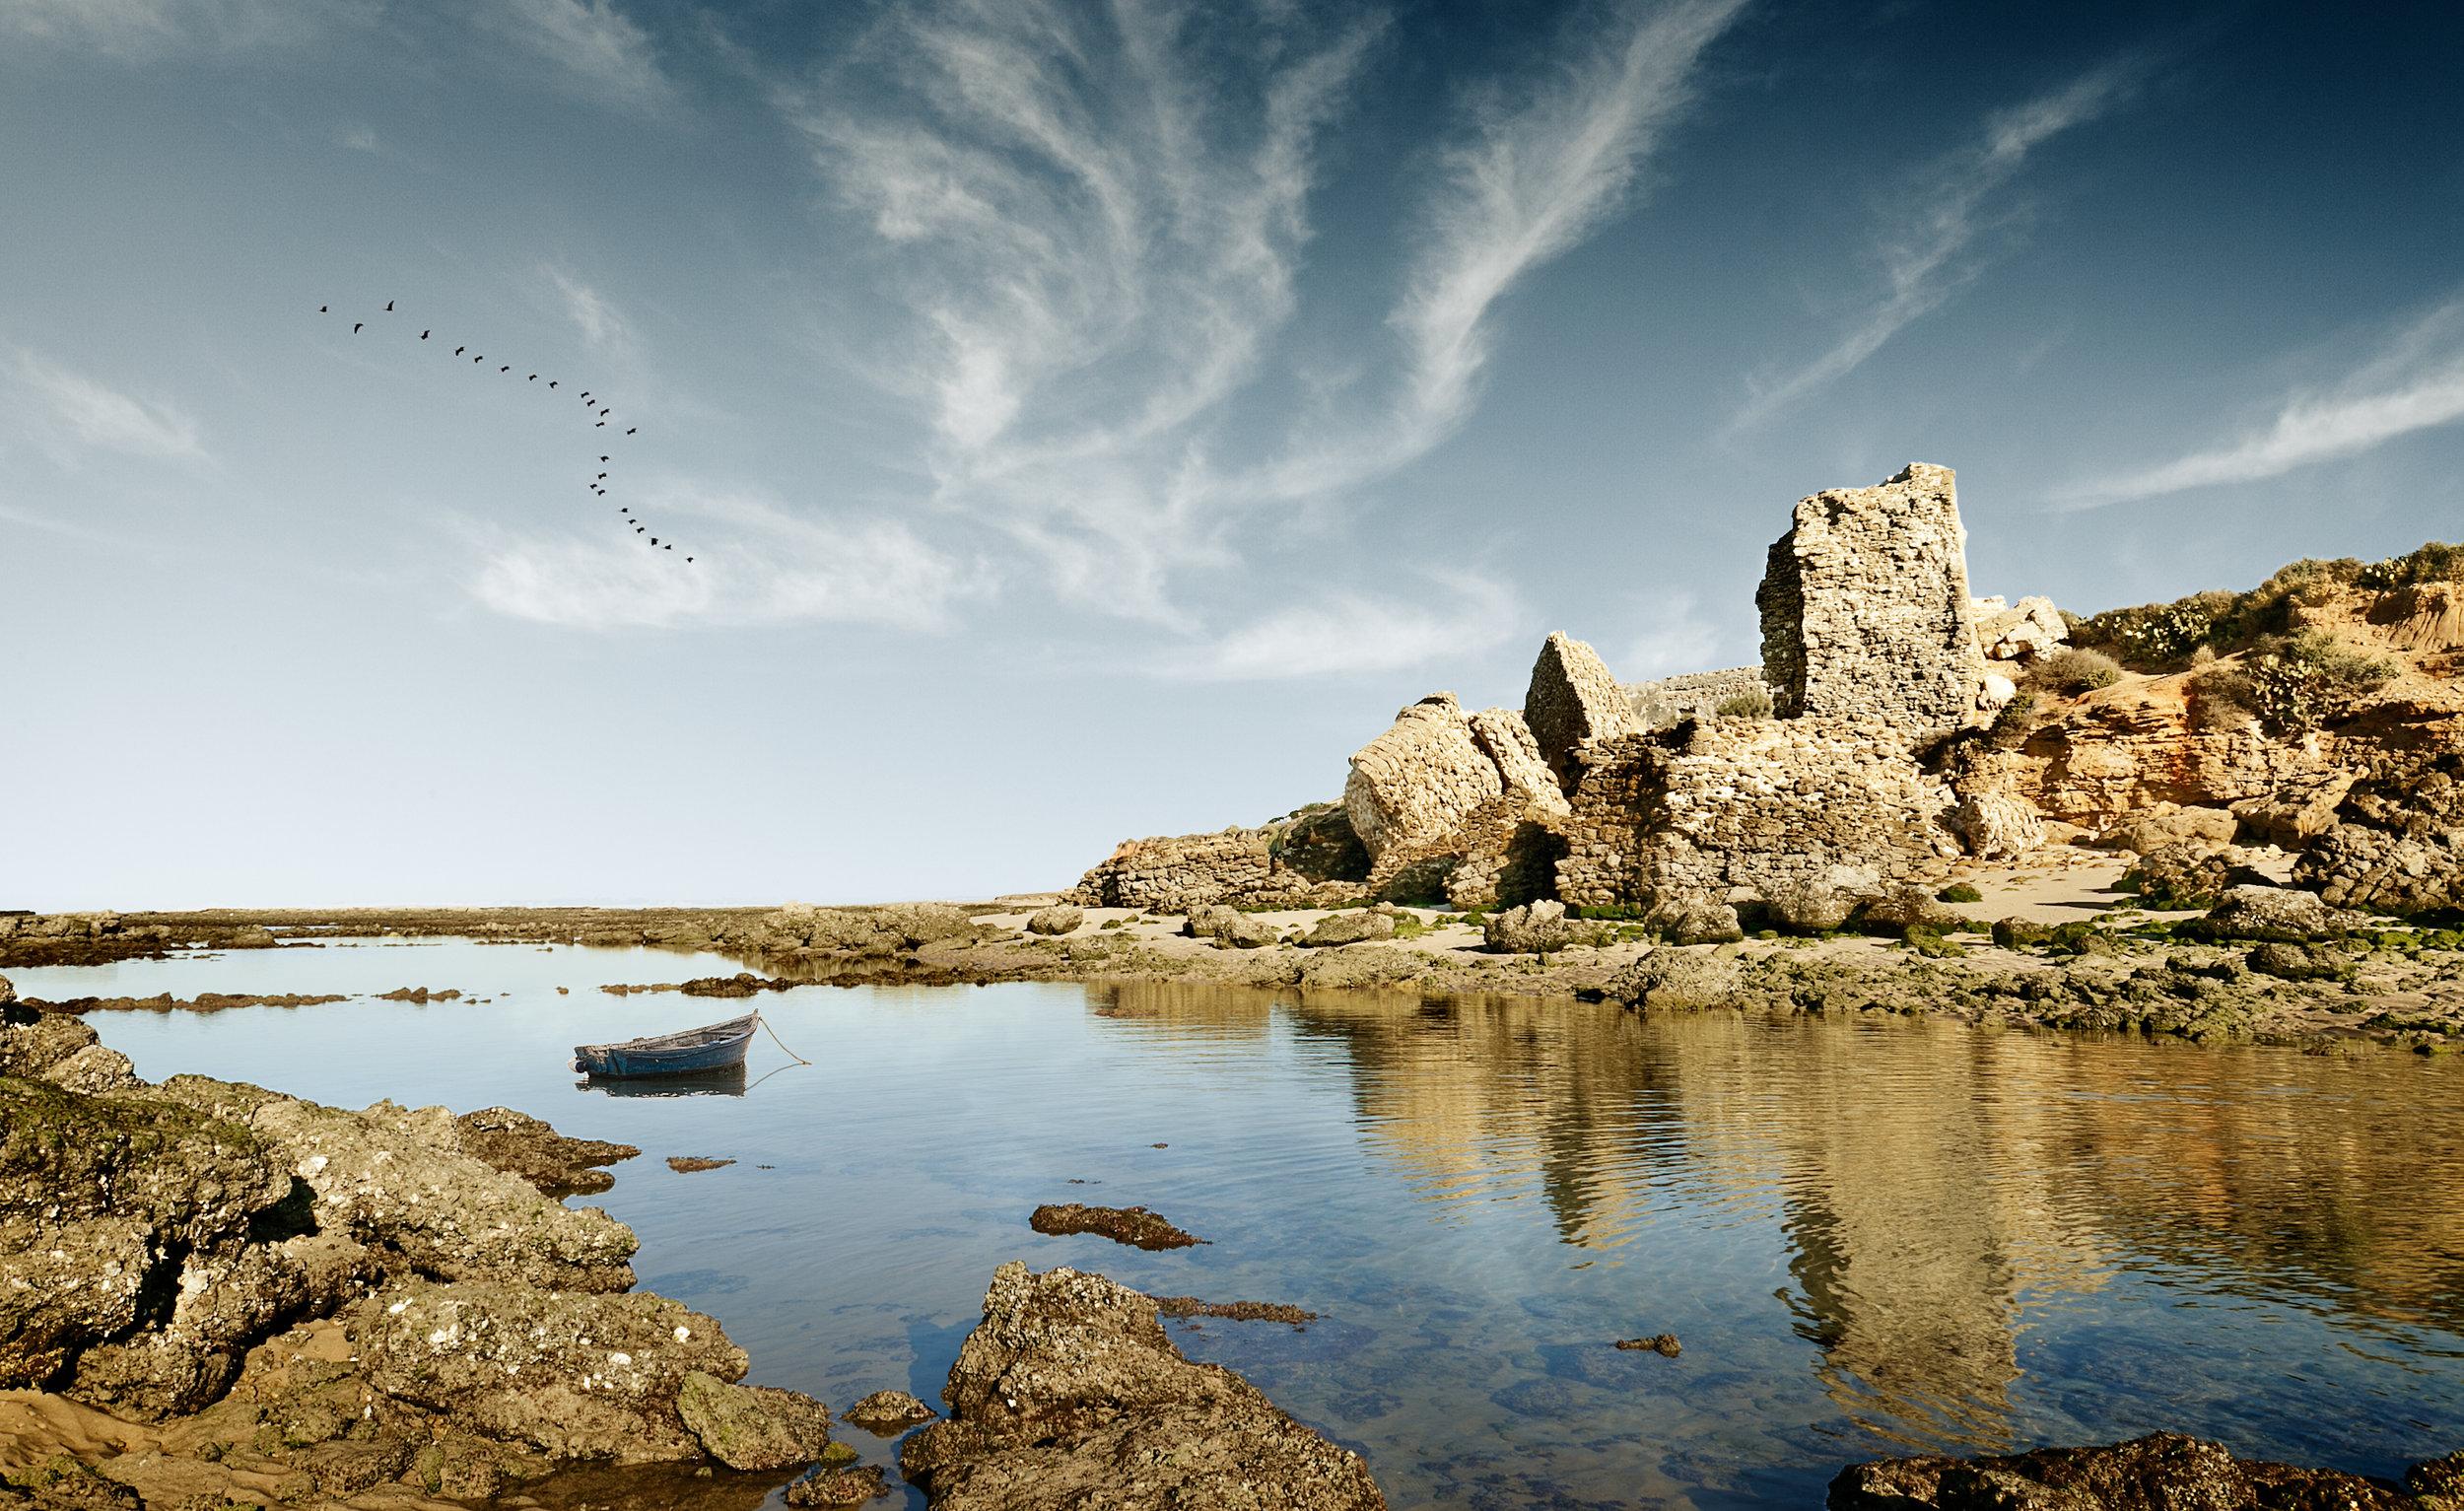 Playa de La Calita. Foto:  Raul Perez Pellicer